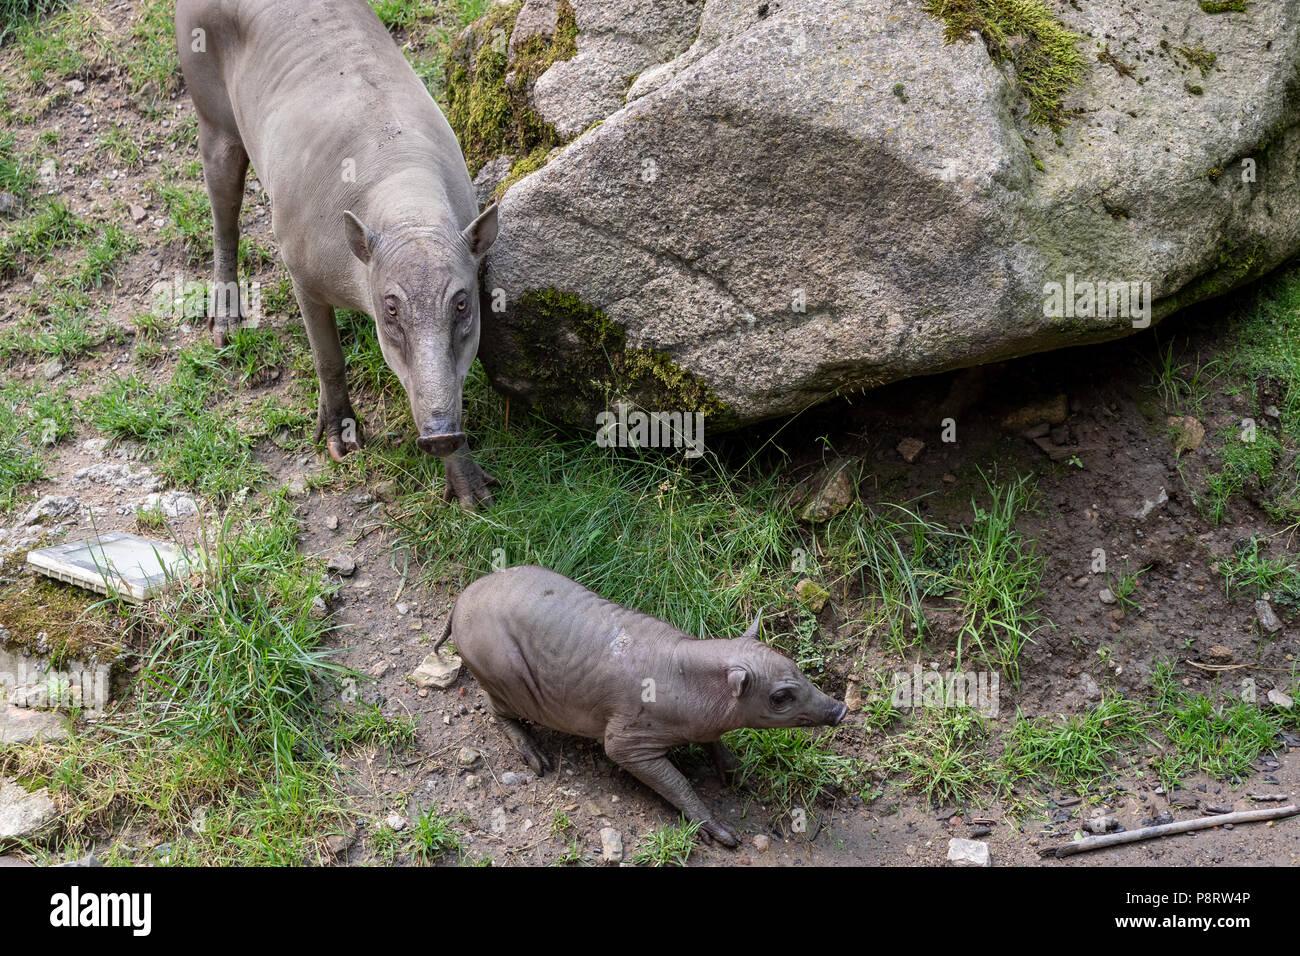 Babirusa Celebes (Babyrousa babyrussa) endangered animal species. Female Buru bairusa and young piglet - Stock Image